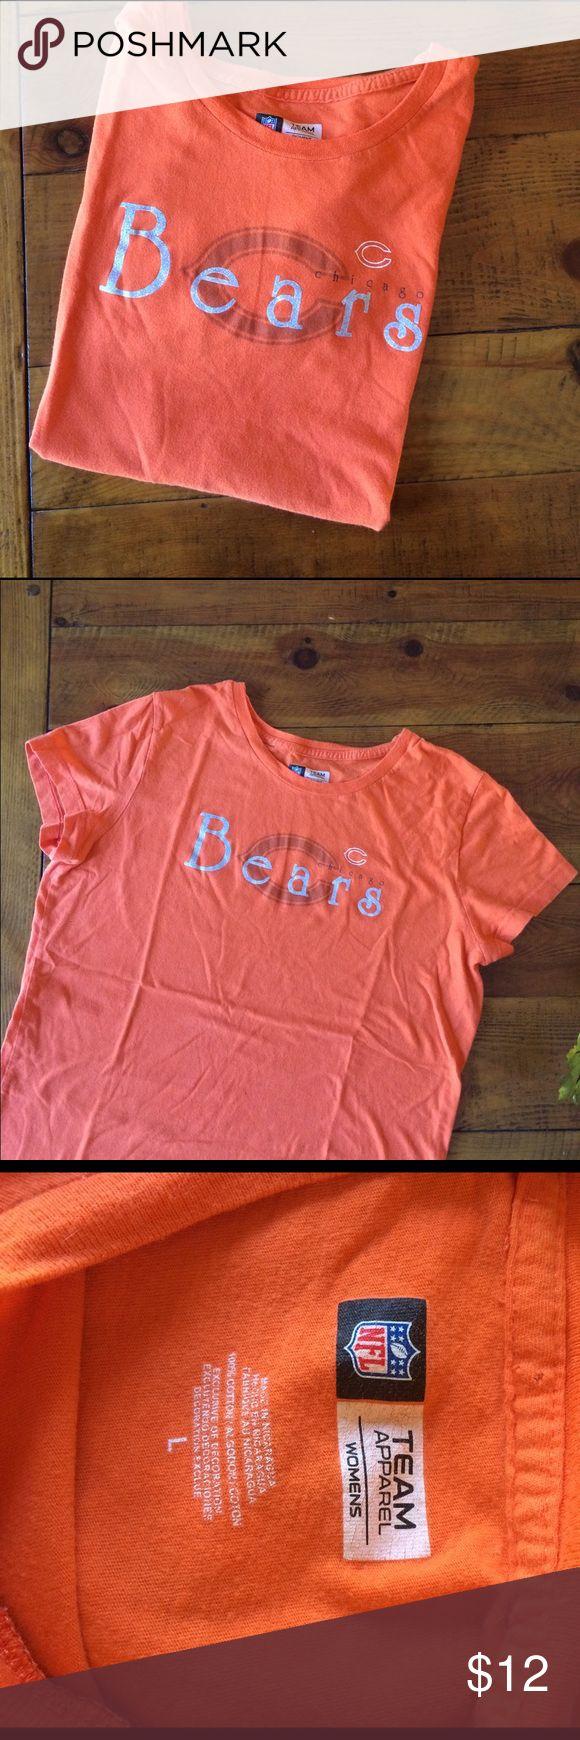 Chicago Bears Team Apparel Chicago Bears Team Apparel in Bears orange with silver logo. NFL Team Apparel Tops Tees - Short Sleeve